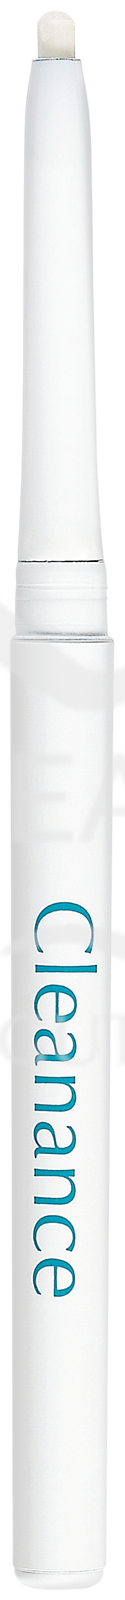 Avène Cleanance Spot Anti-Pickel-Stift